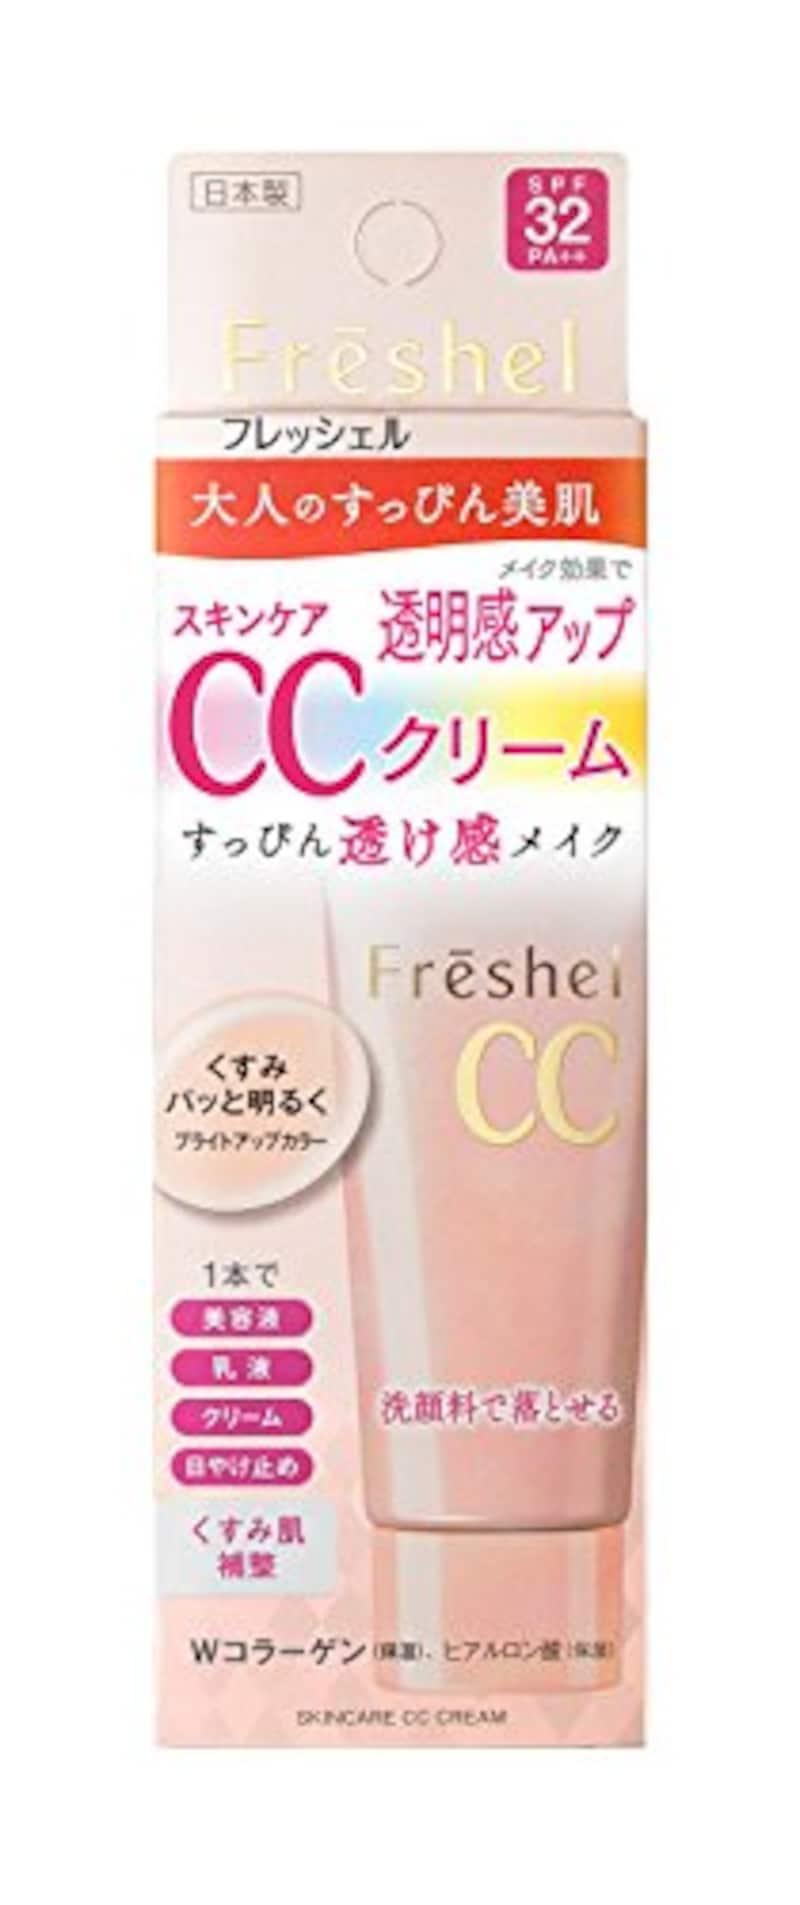 Freshel(フレッシェル),スキンケアCCクリーム